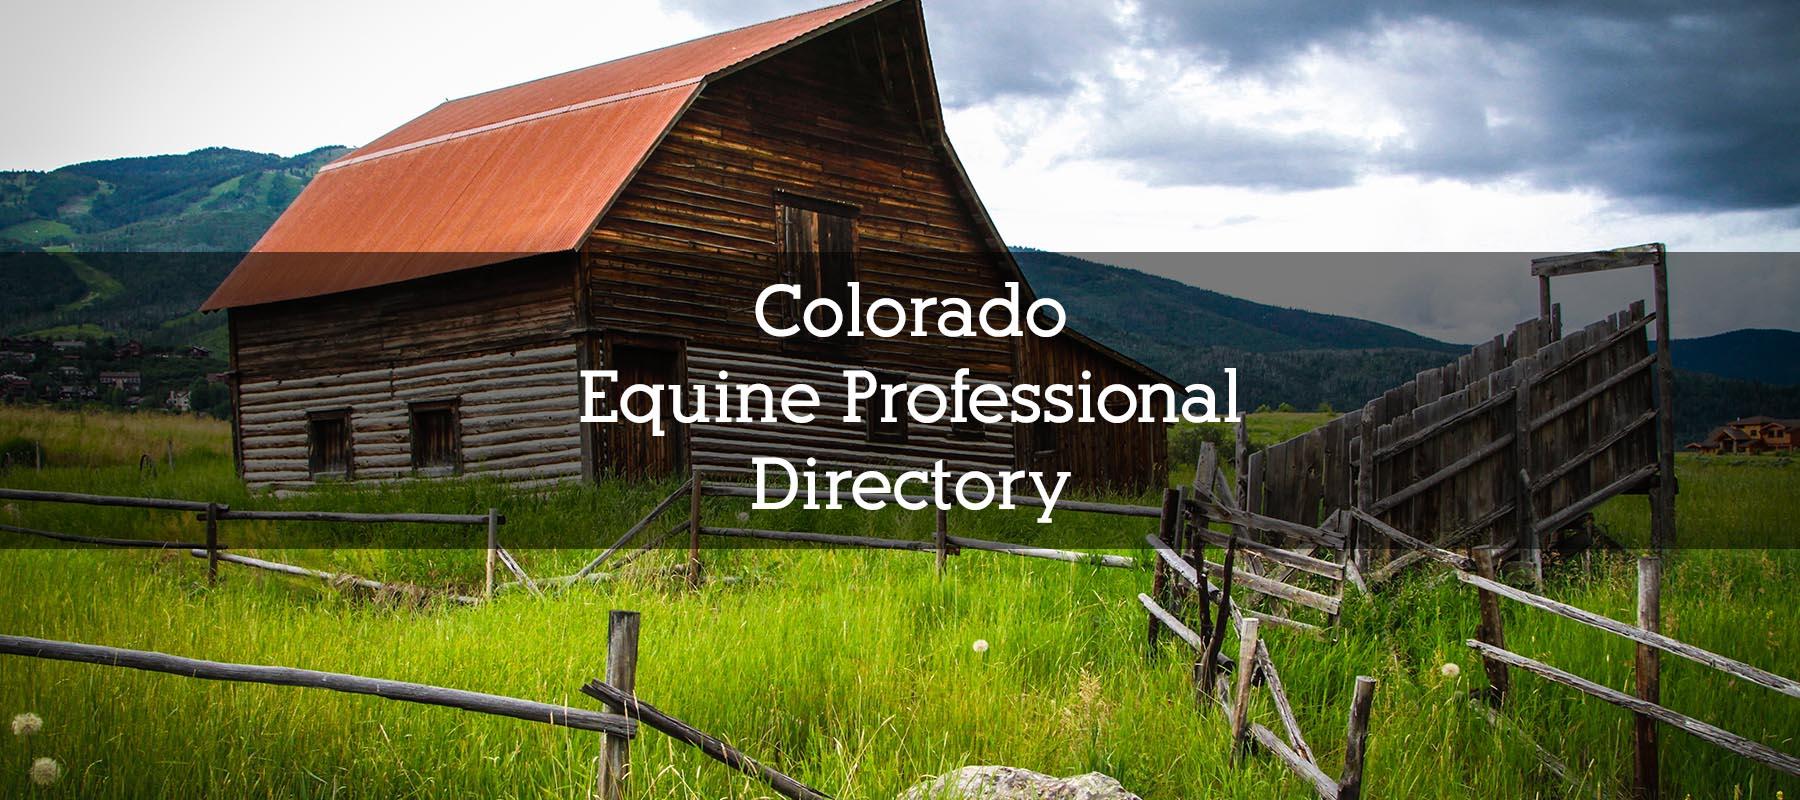 Colorado Equine Professional Directory